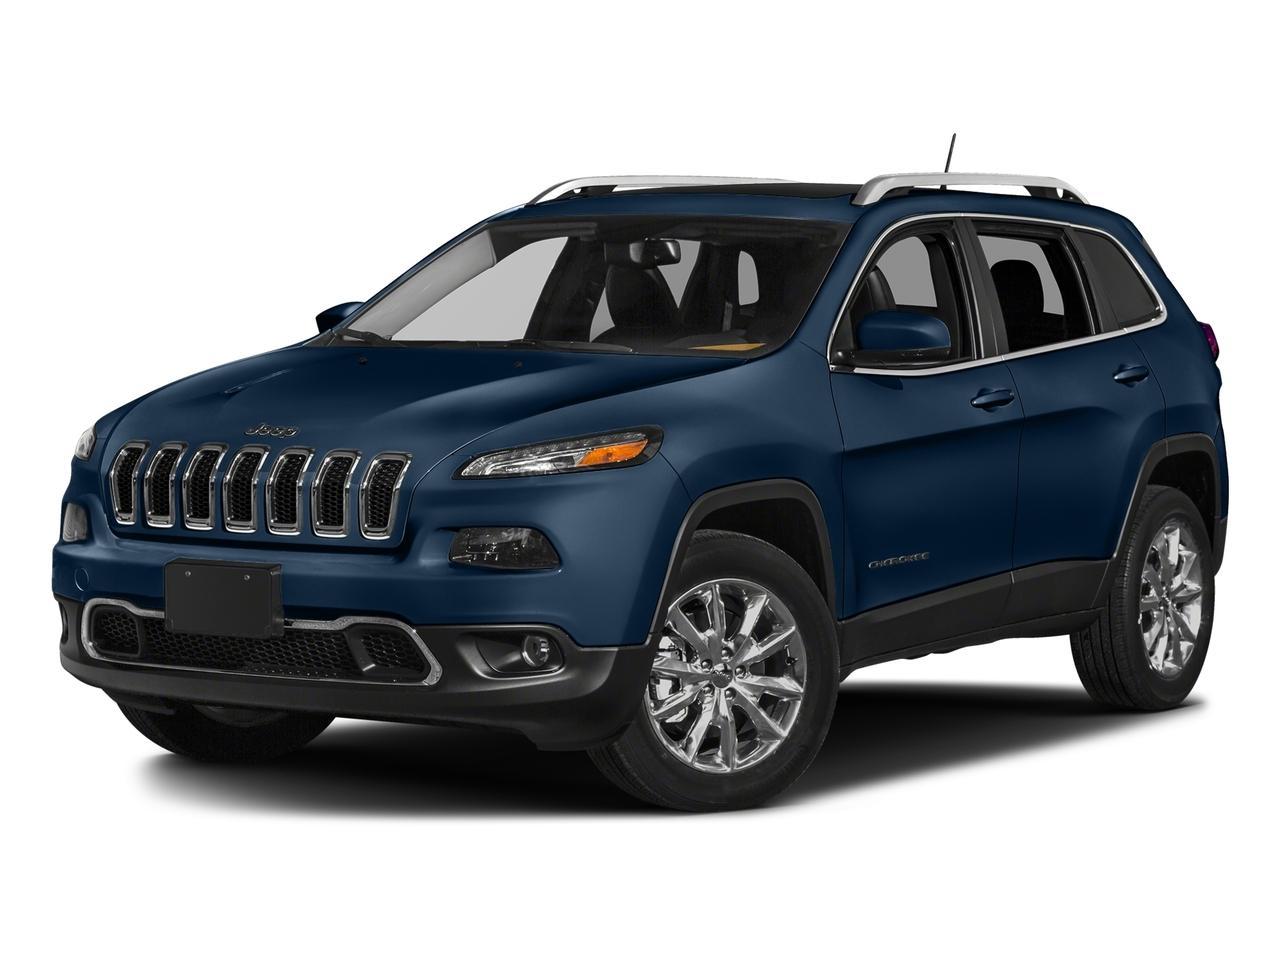 2018 Jeep Cherokee Vehicle Photo in Streetsboro, OH 44241